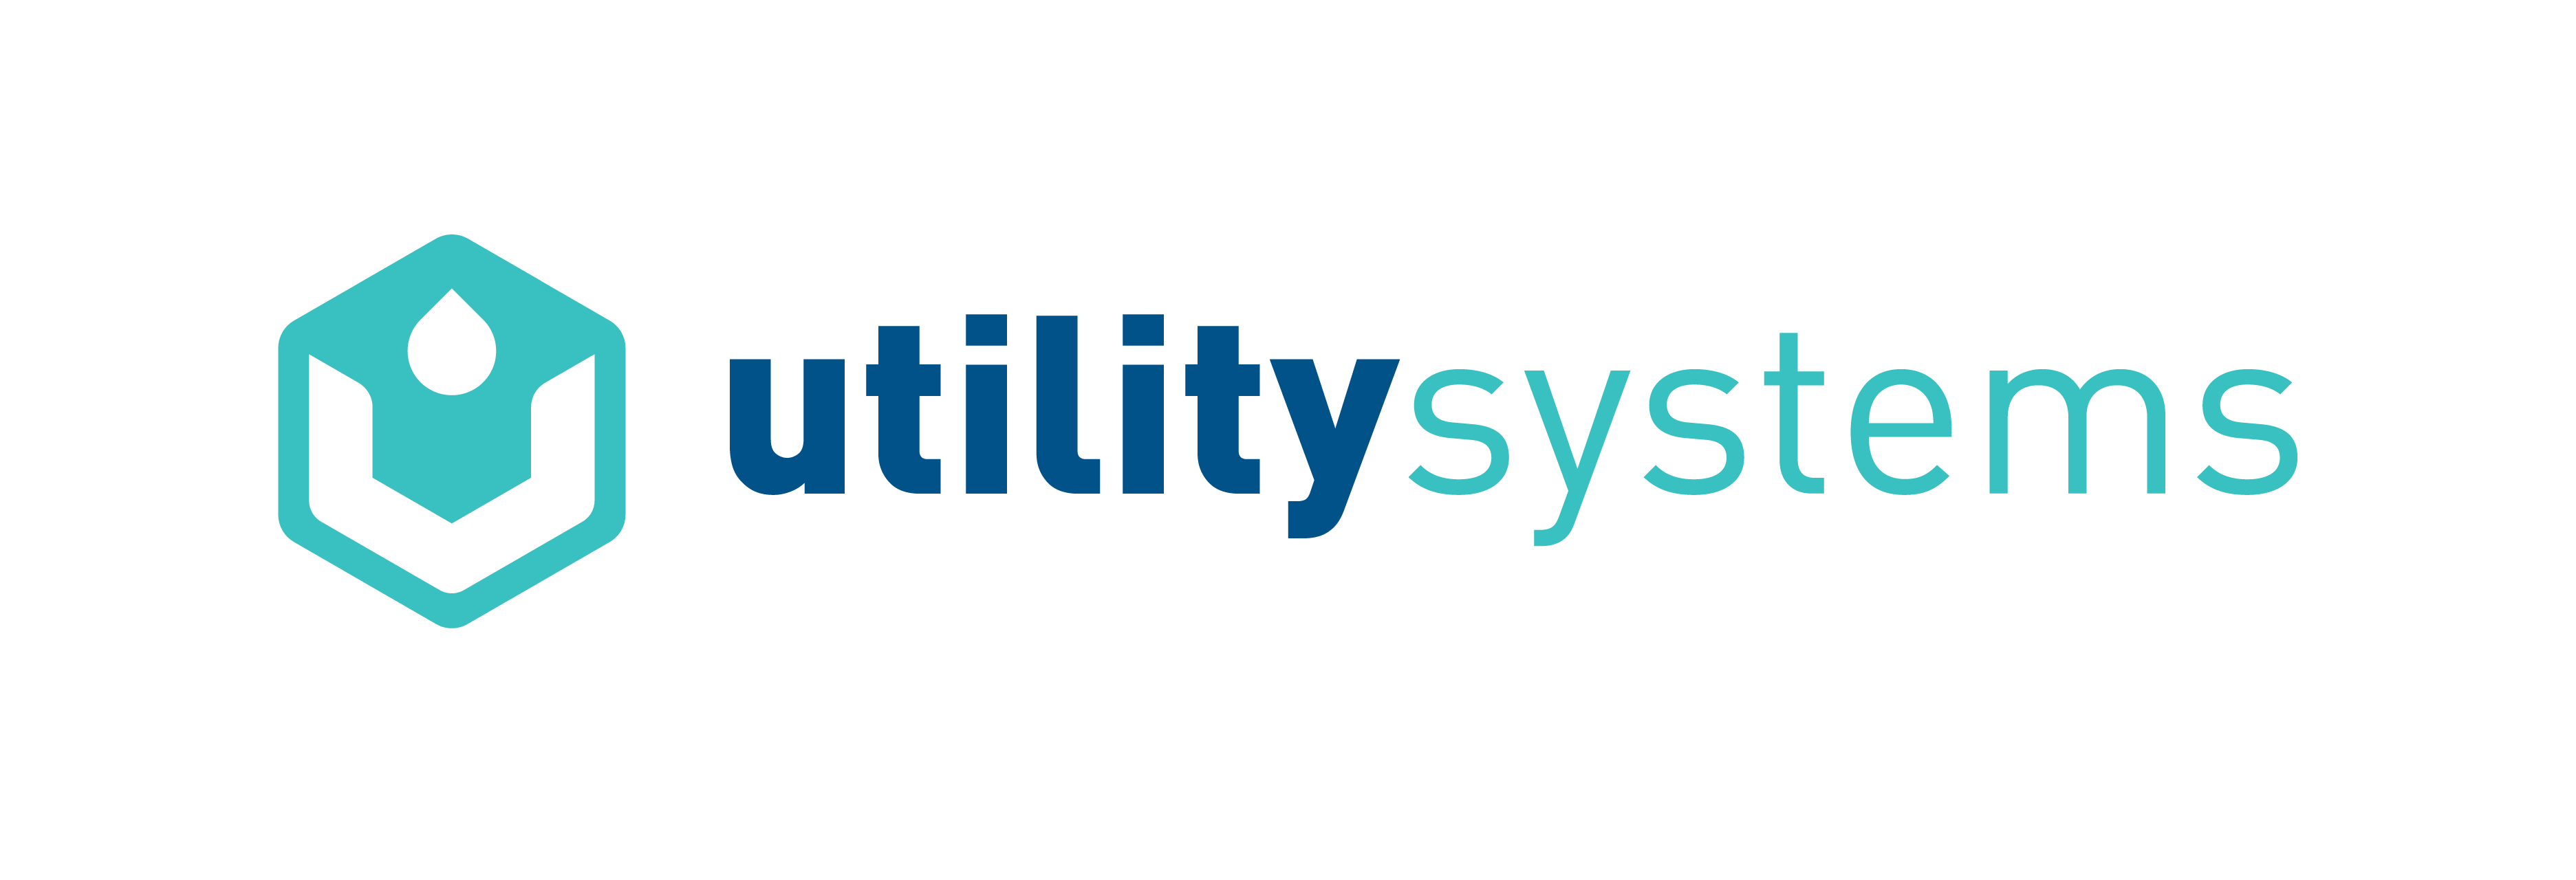 Utility systems logo